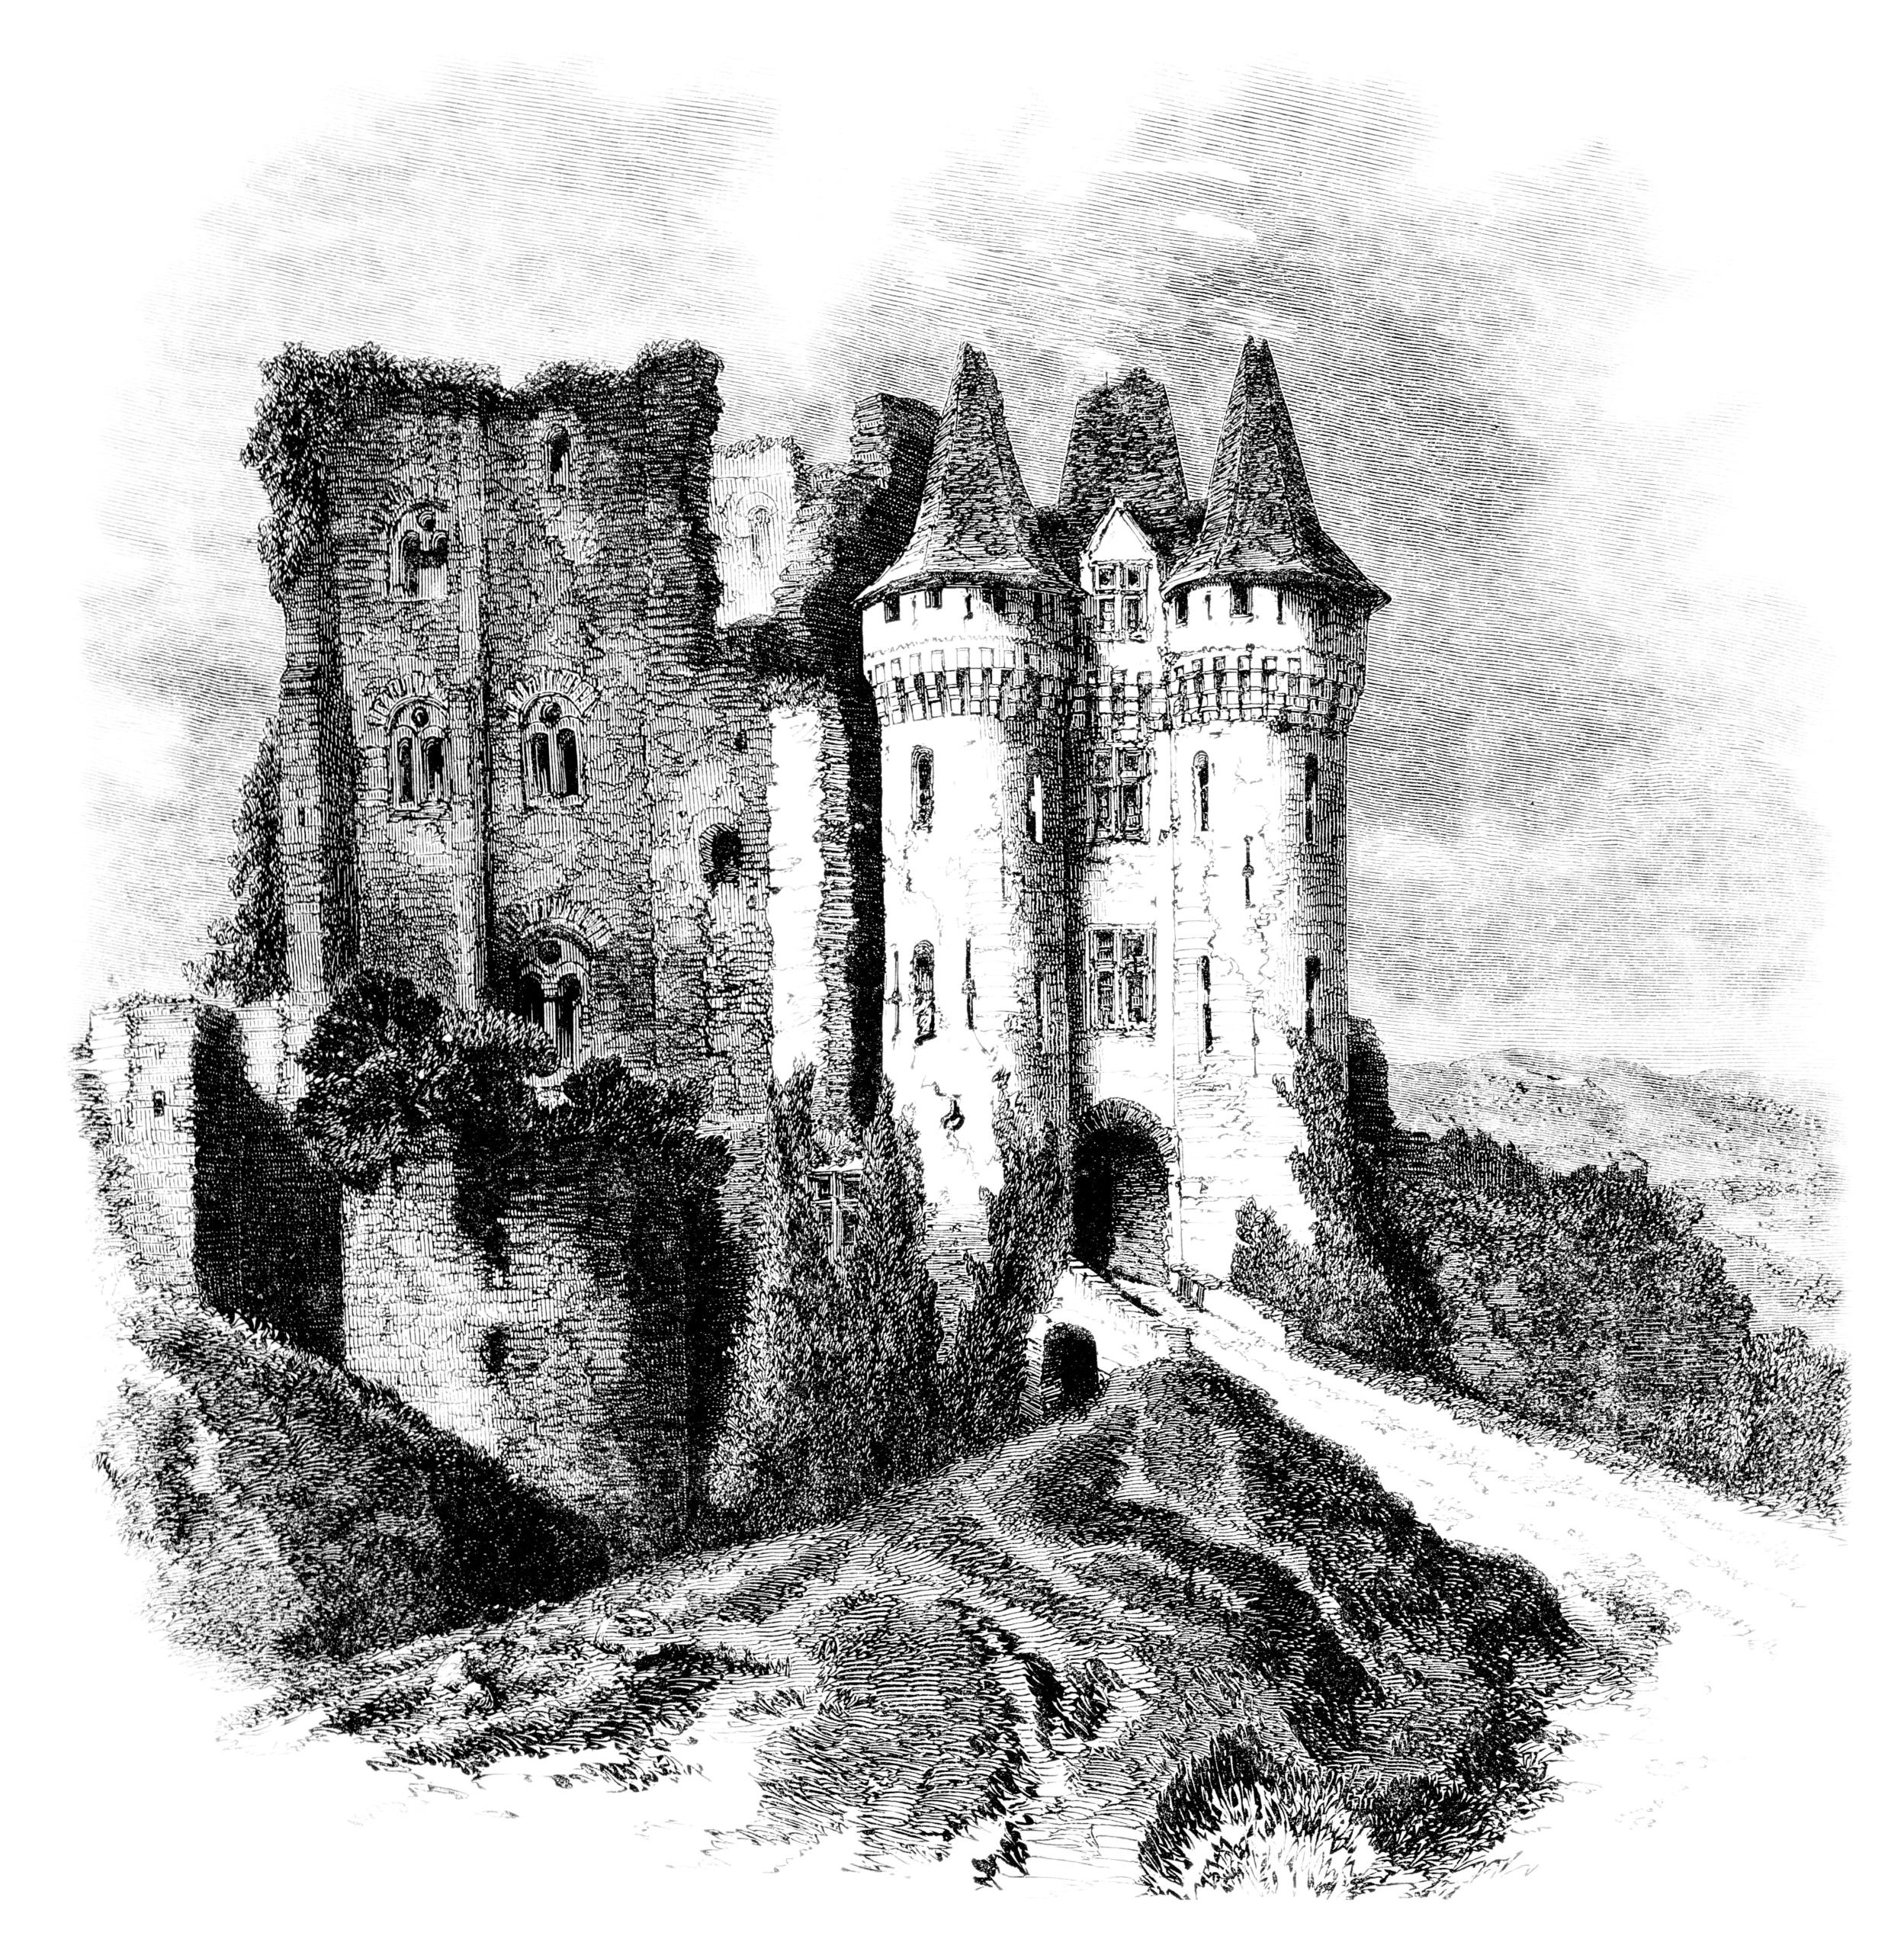 Abbildung, gravure, engraving : 1860